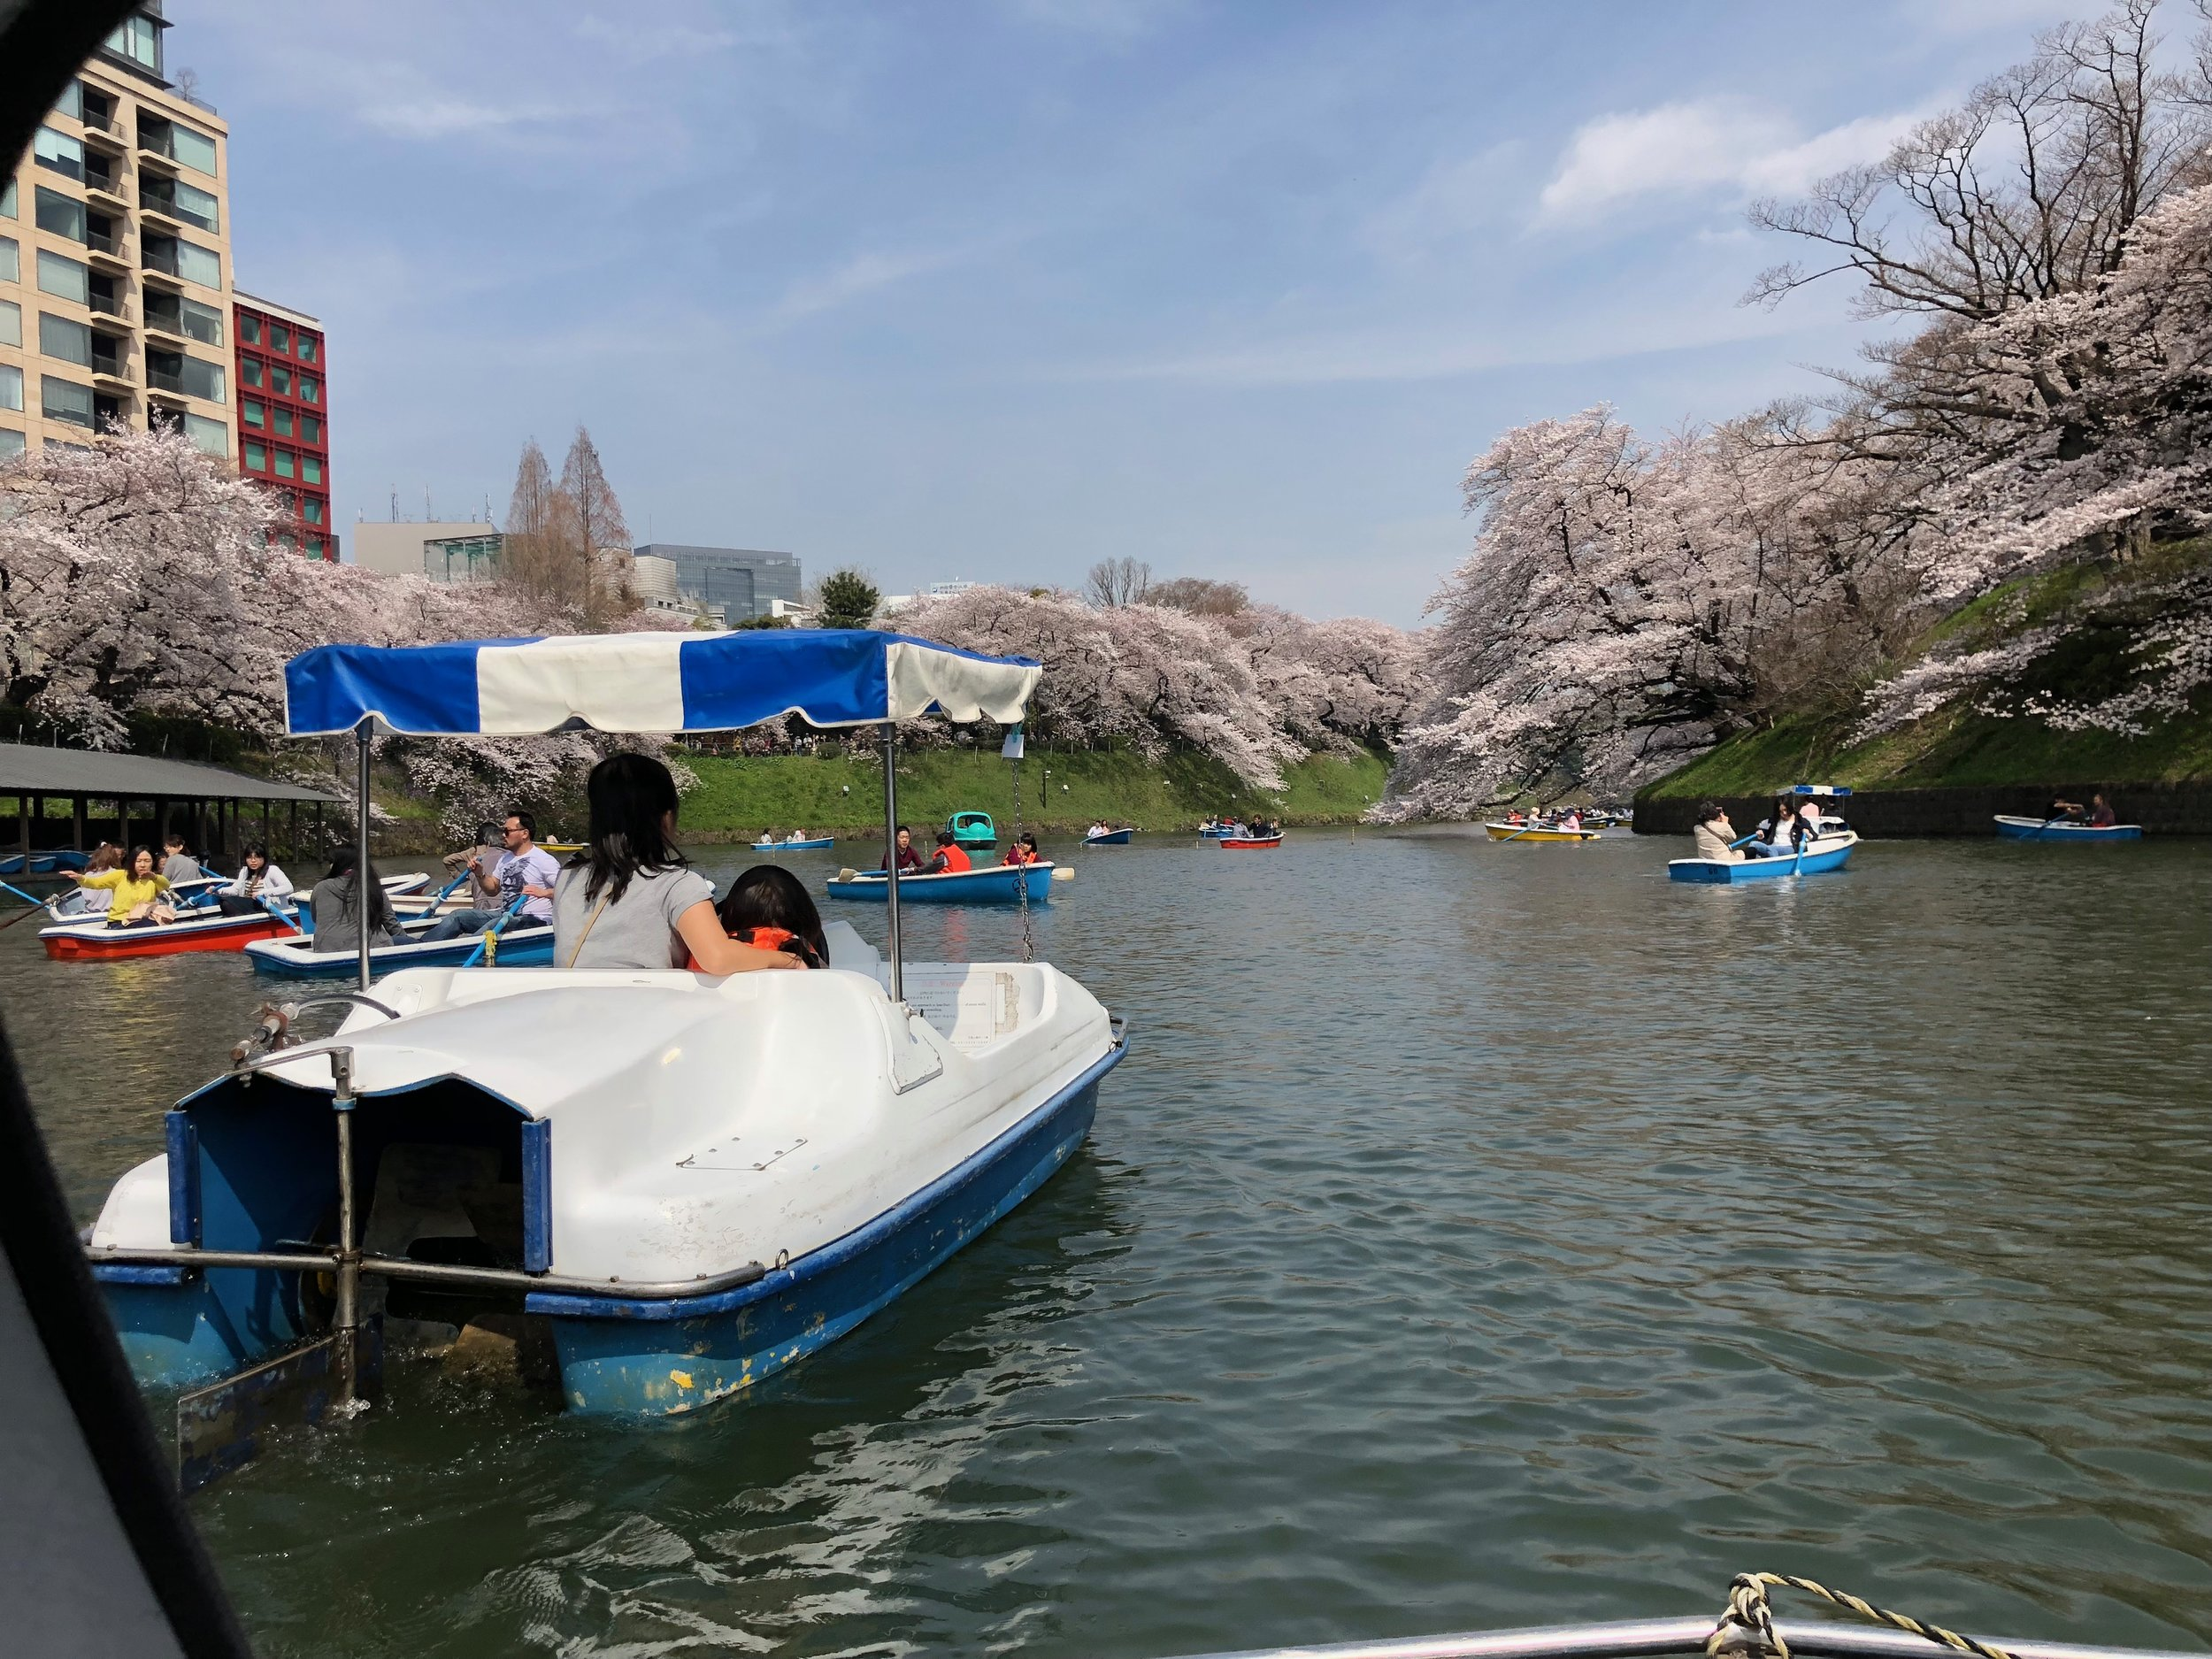 Cherry Blossom Season on meethaha.com